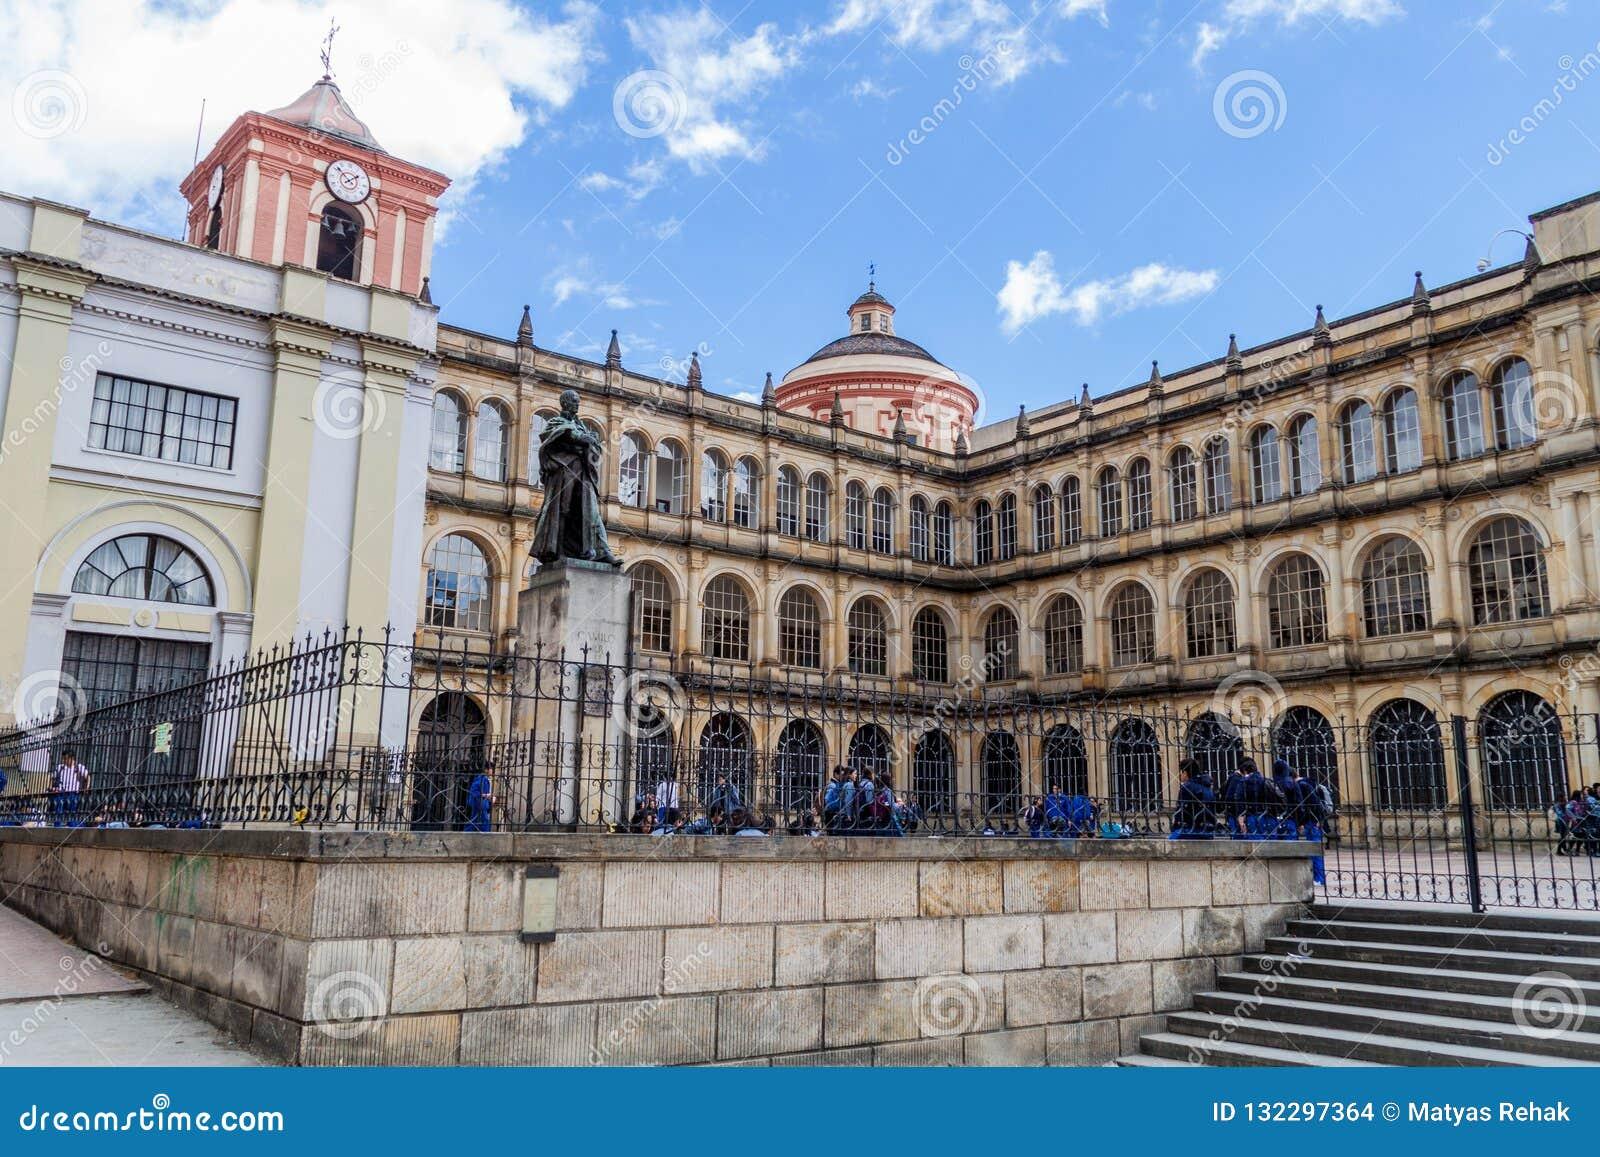 BOGOTA, COLOMBIA - SEPTEMBER 24, 2015: College of St. Bartholomew Colegio Mayor de San Bartolome in downtown of Bogot